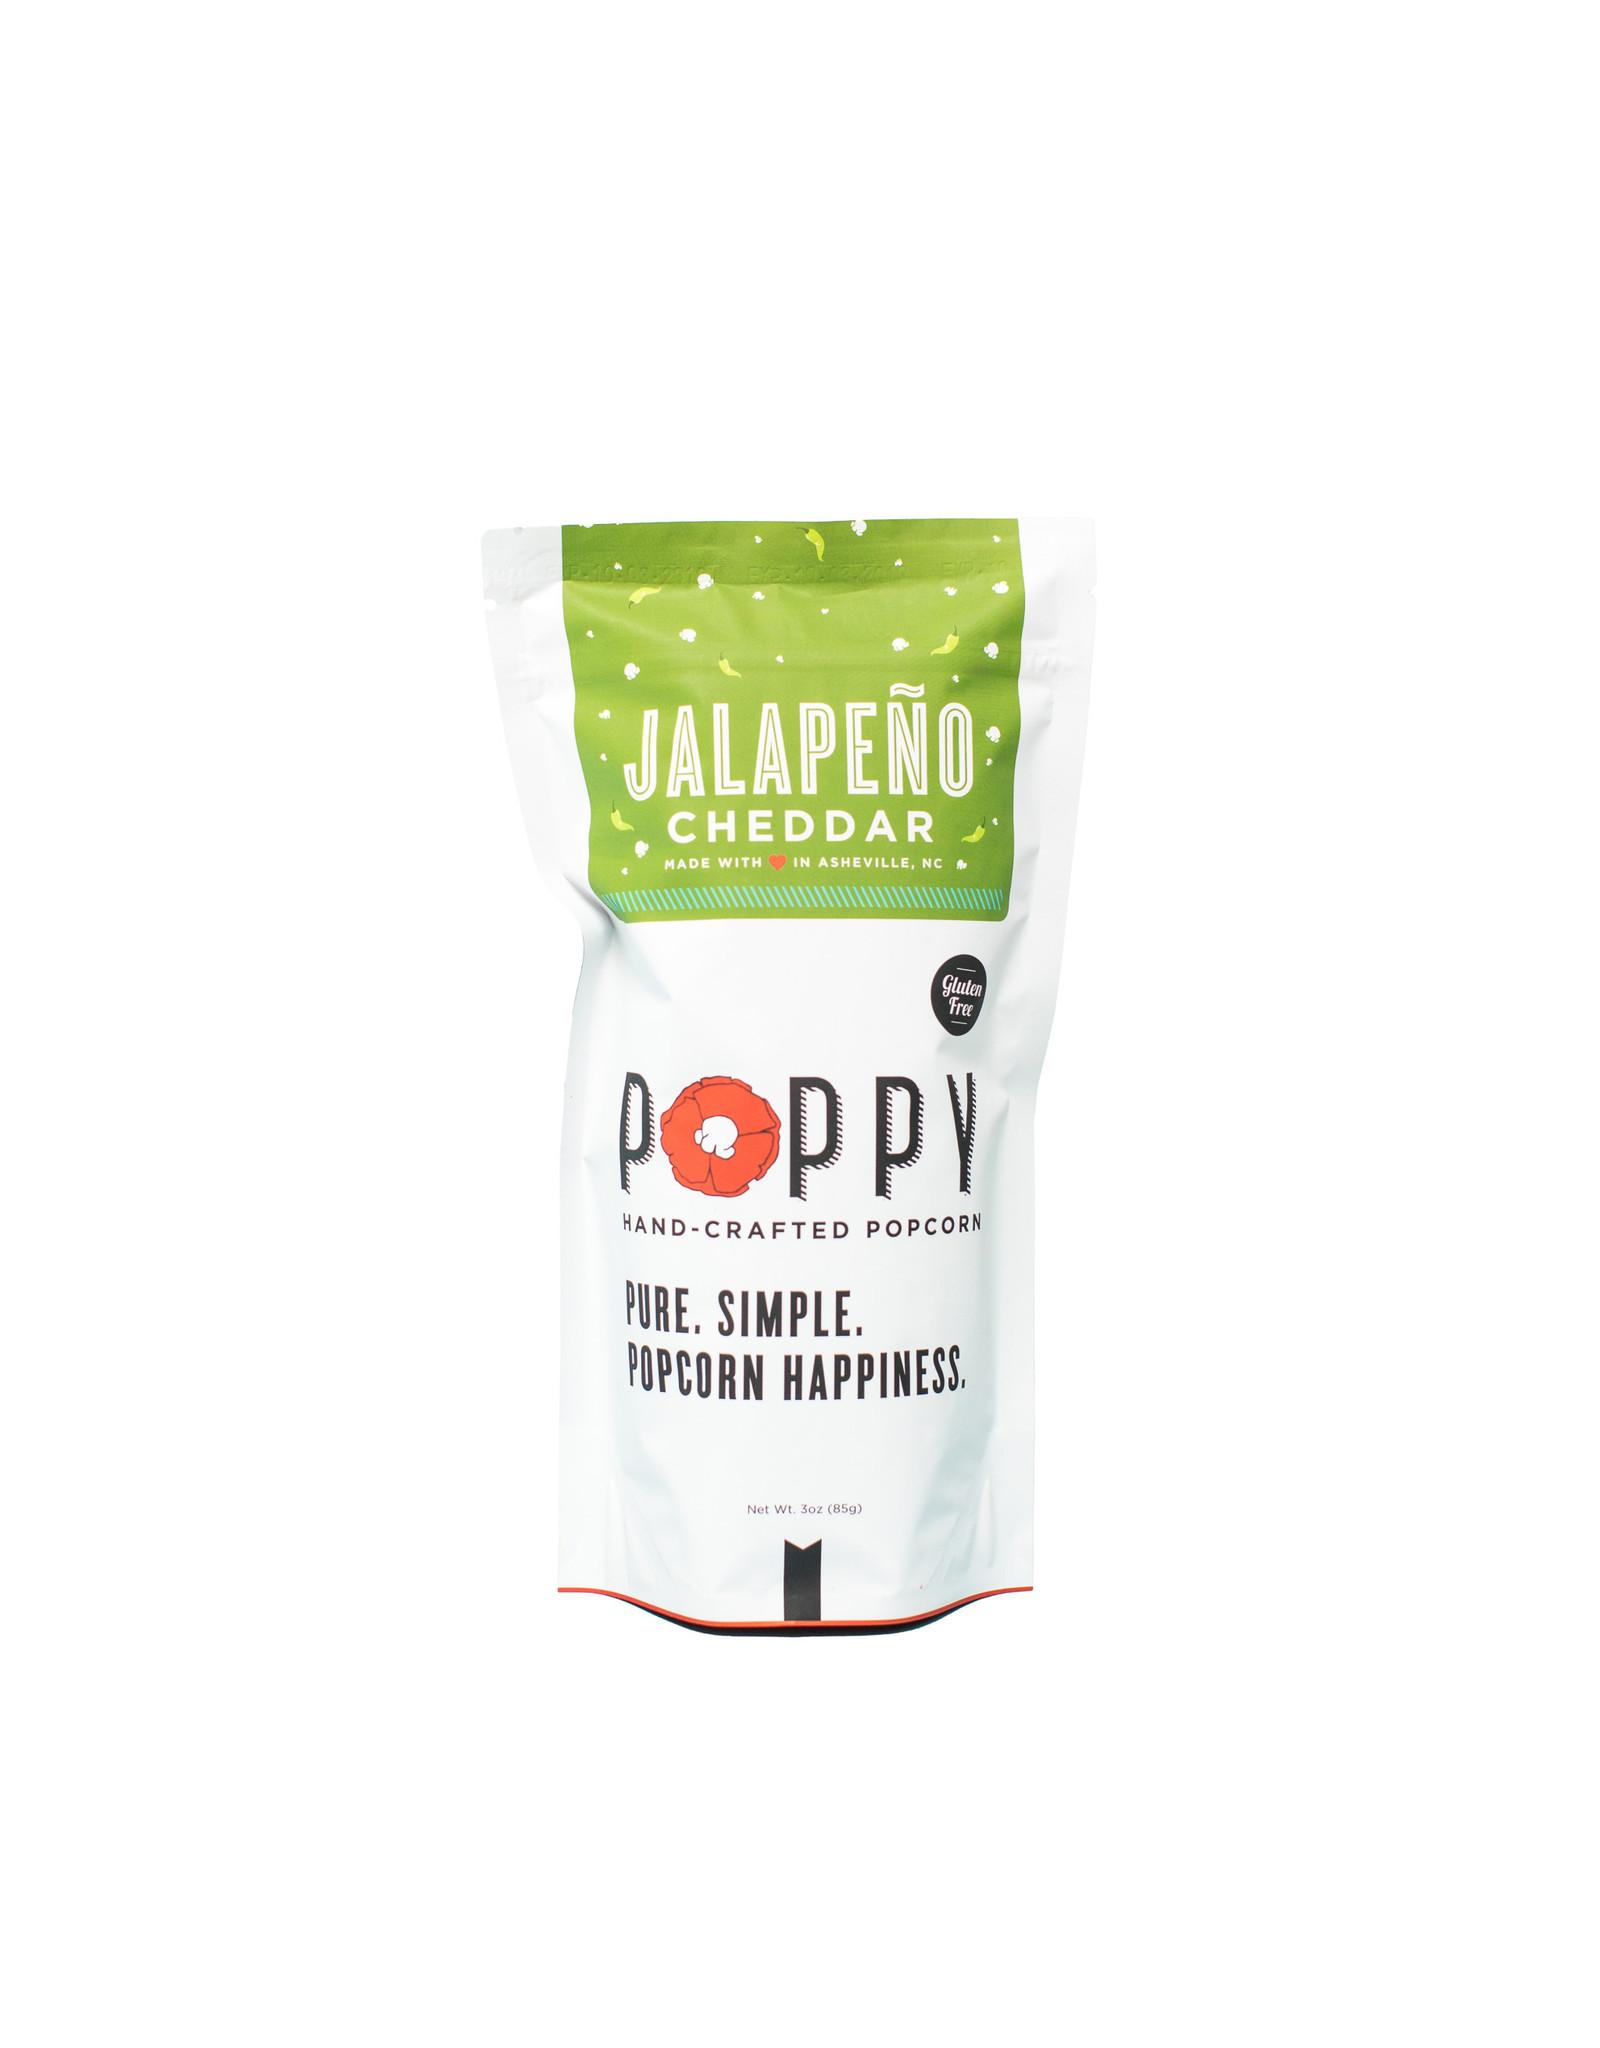 Poppy Jalapeno Cheddar Popcorn Market Bag